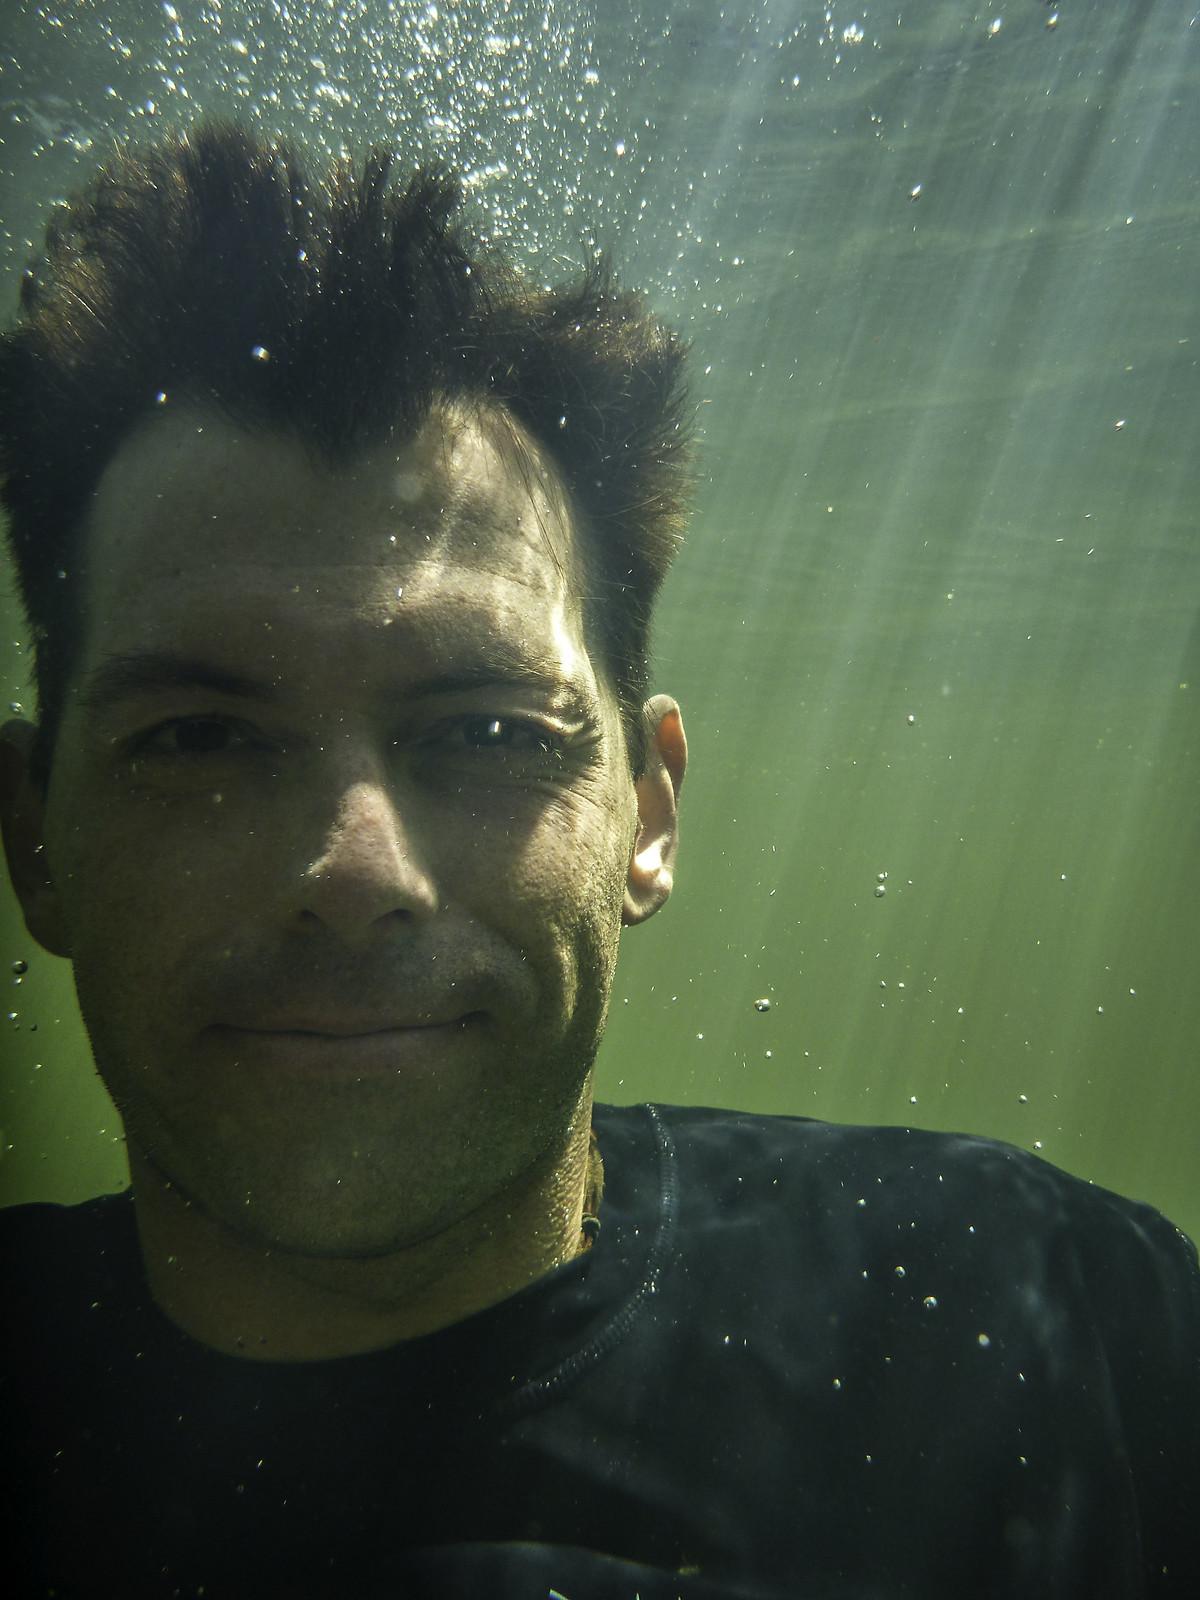 Underwater selfie #1, Douglas-Apsley waterhole, Douglas-Apsley National Park